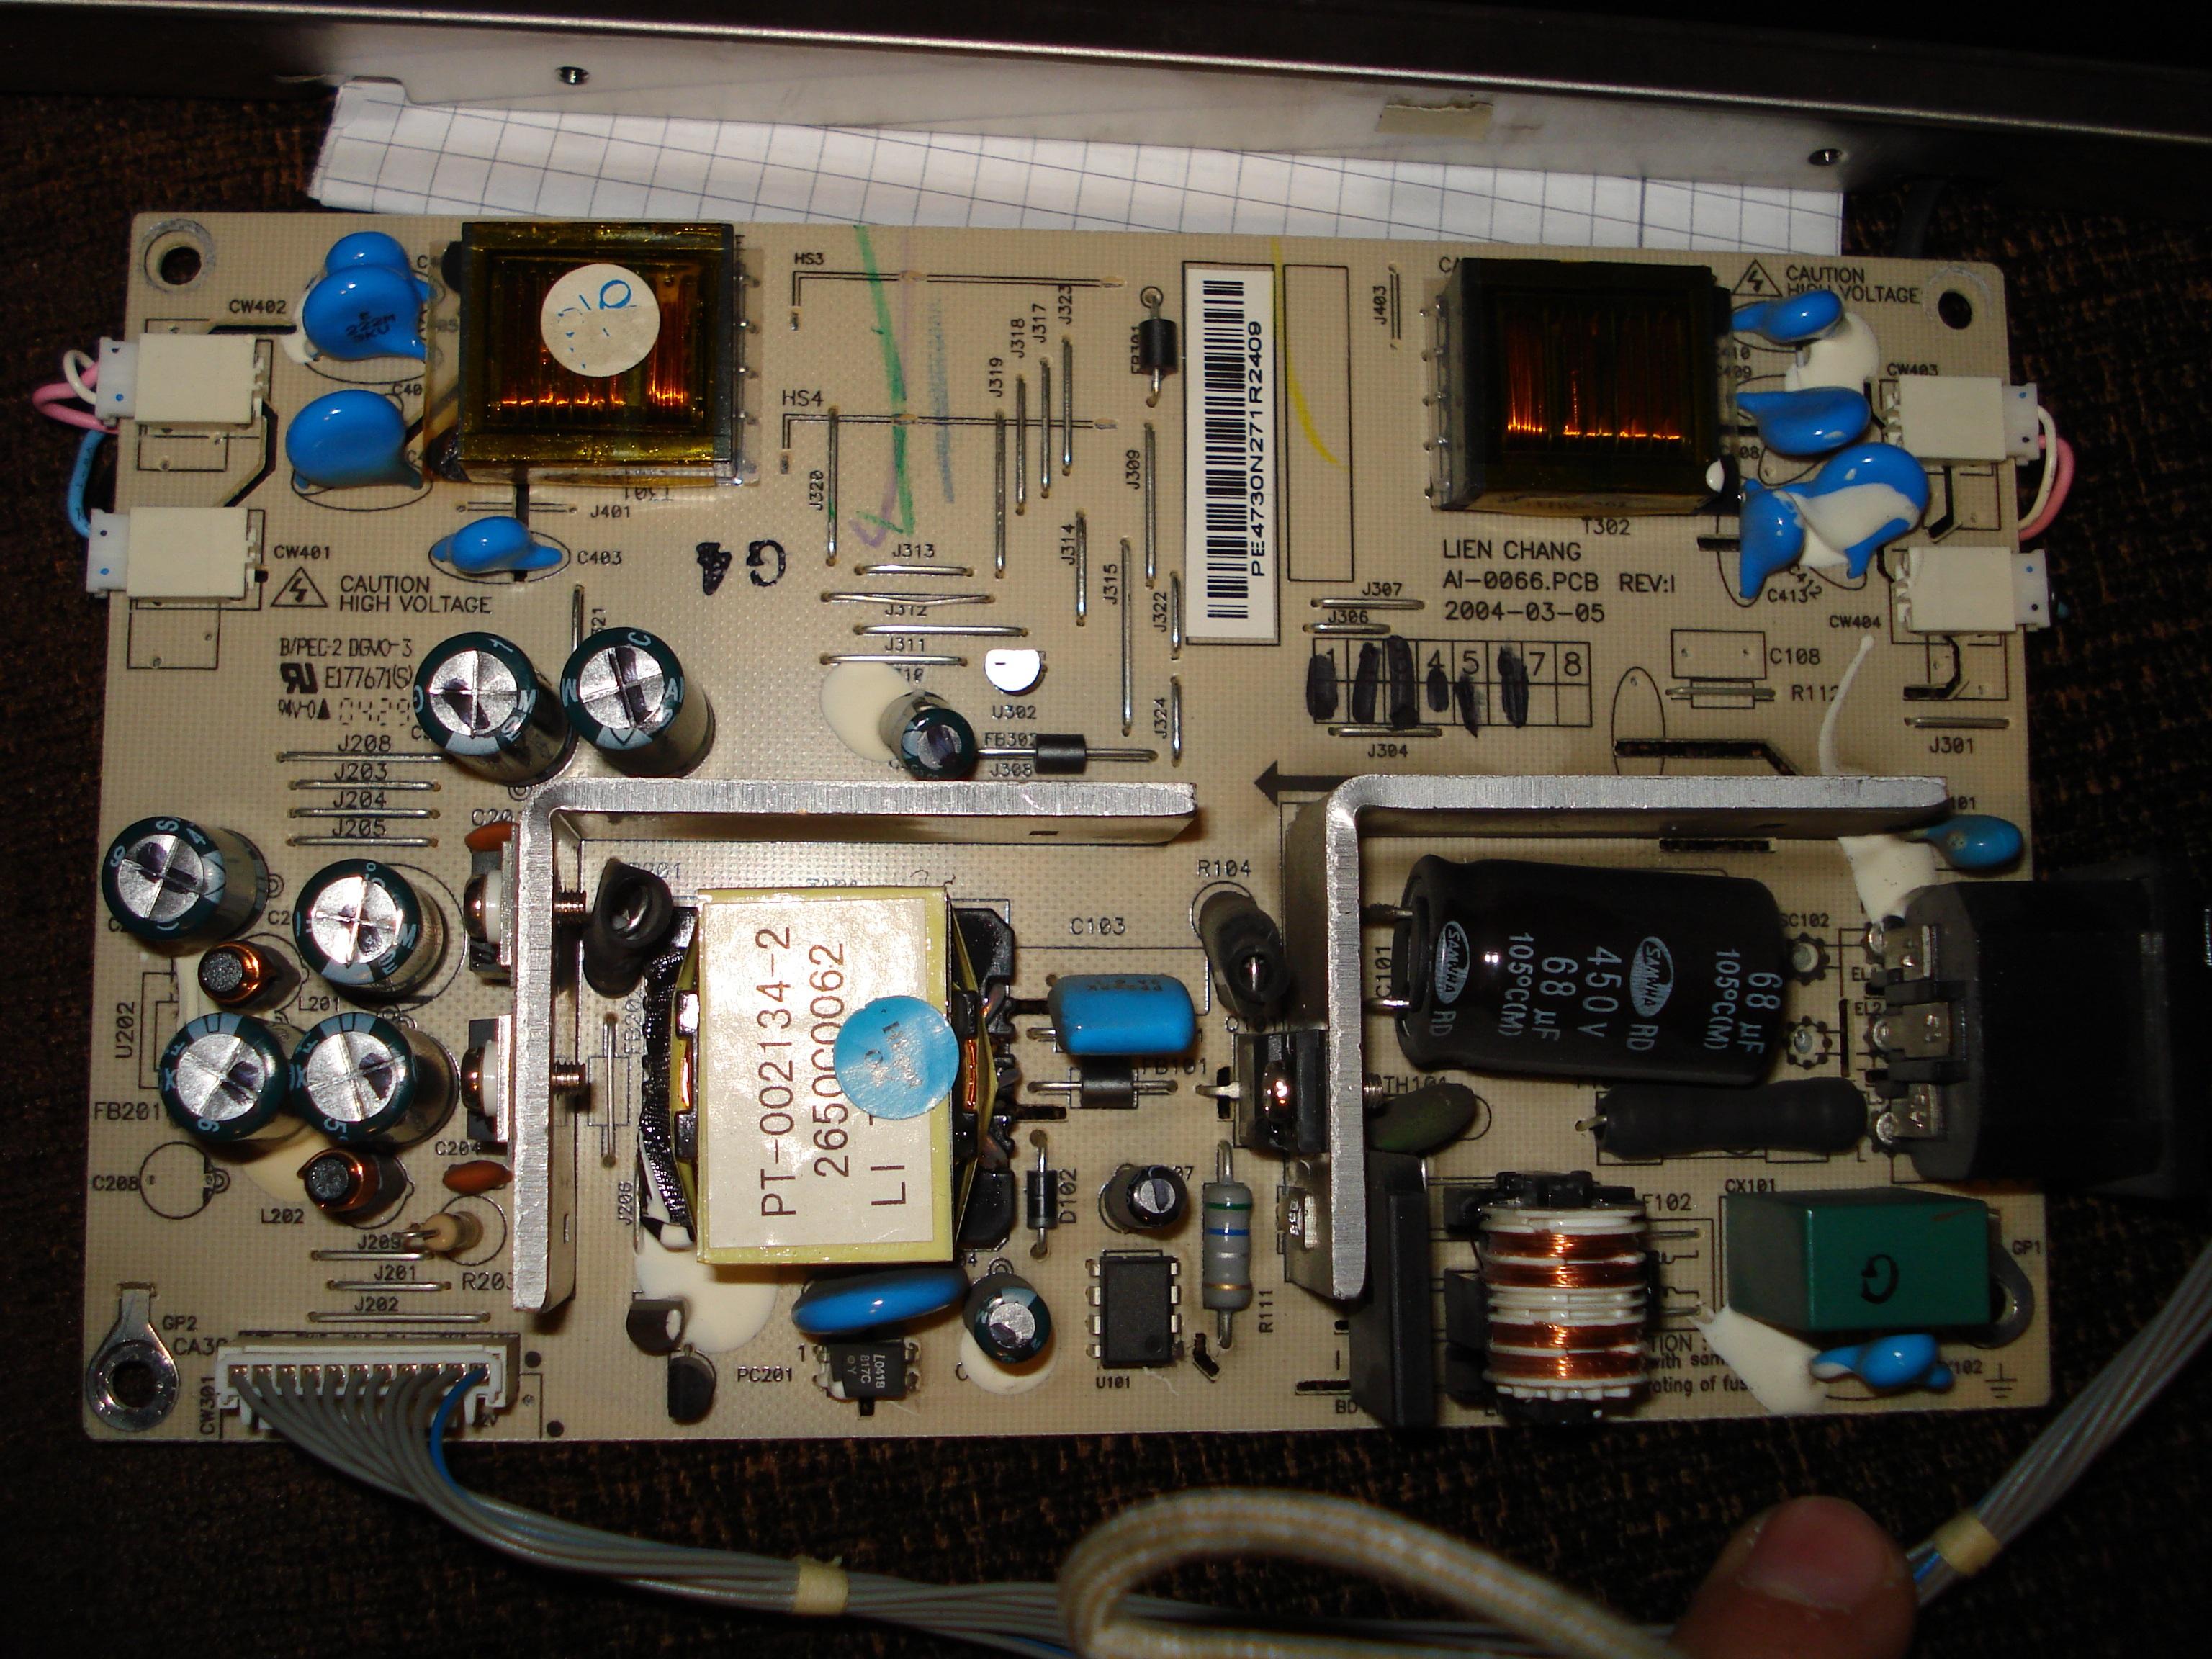 ADI AC97 Audio Driver for Desktop Boards